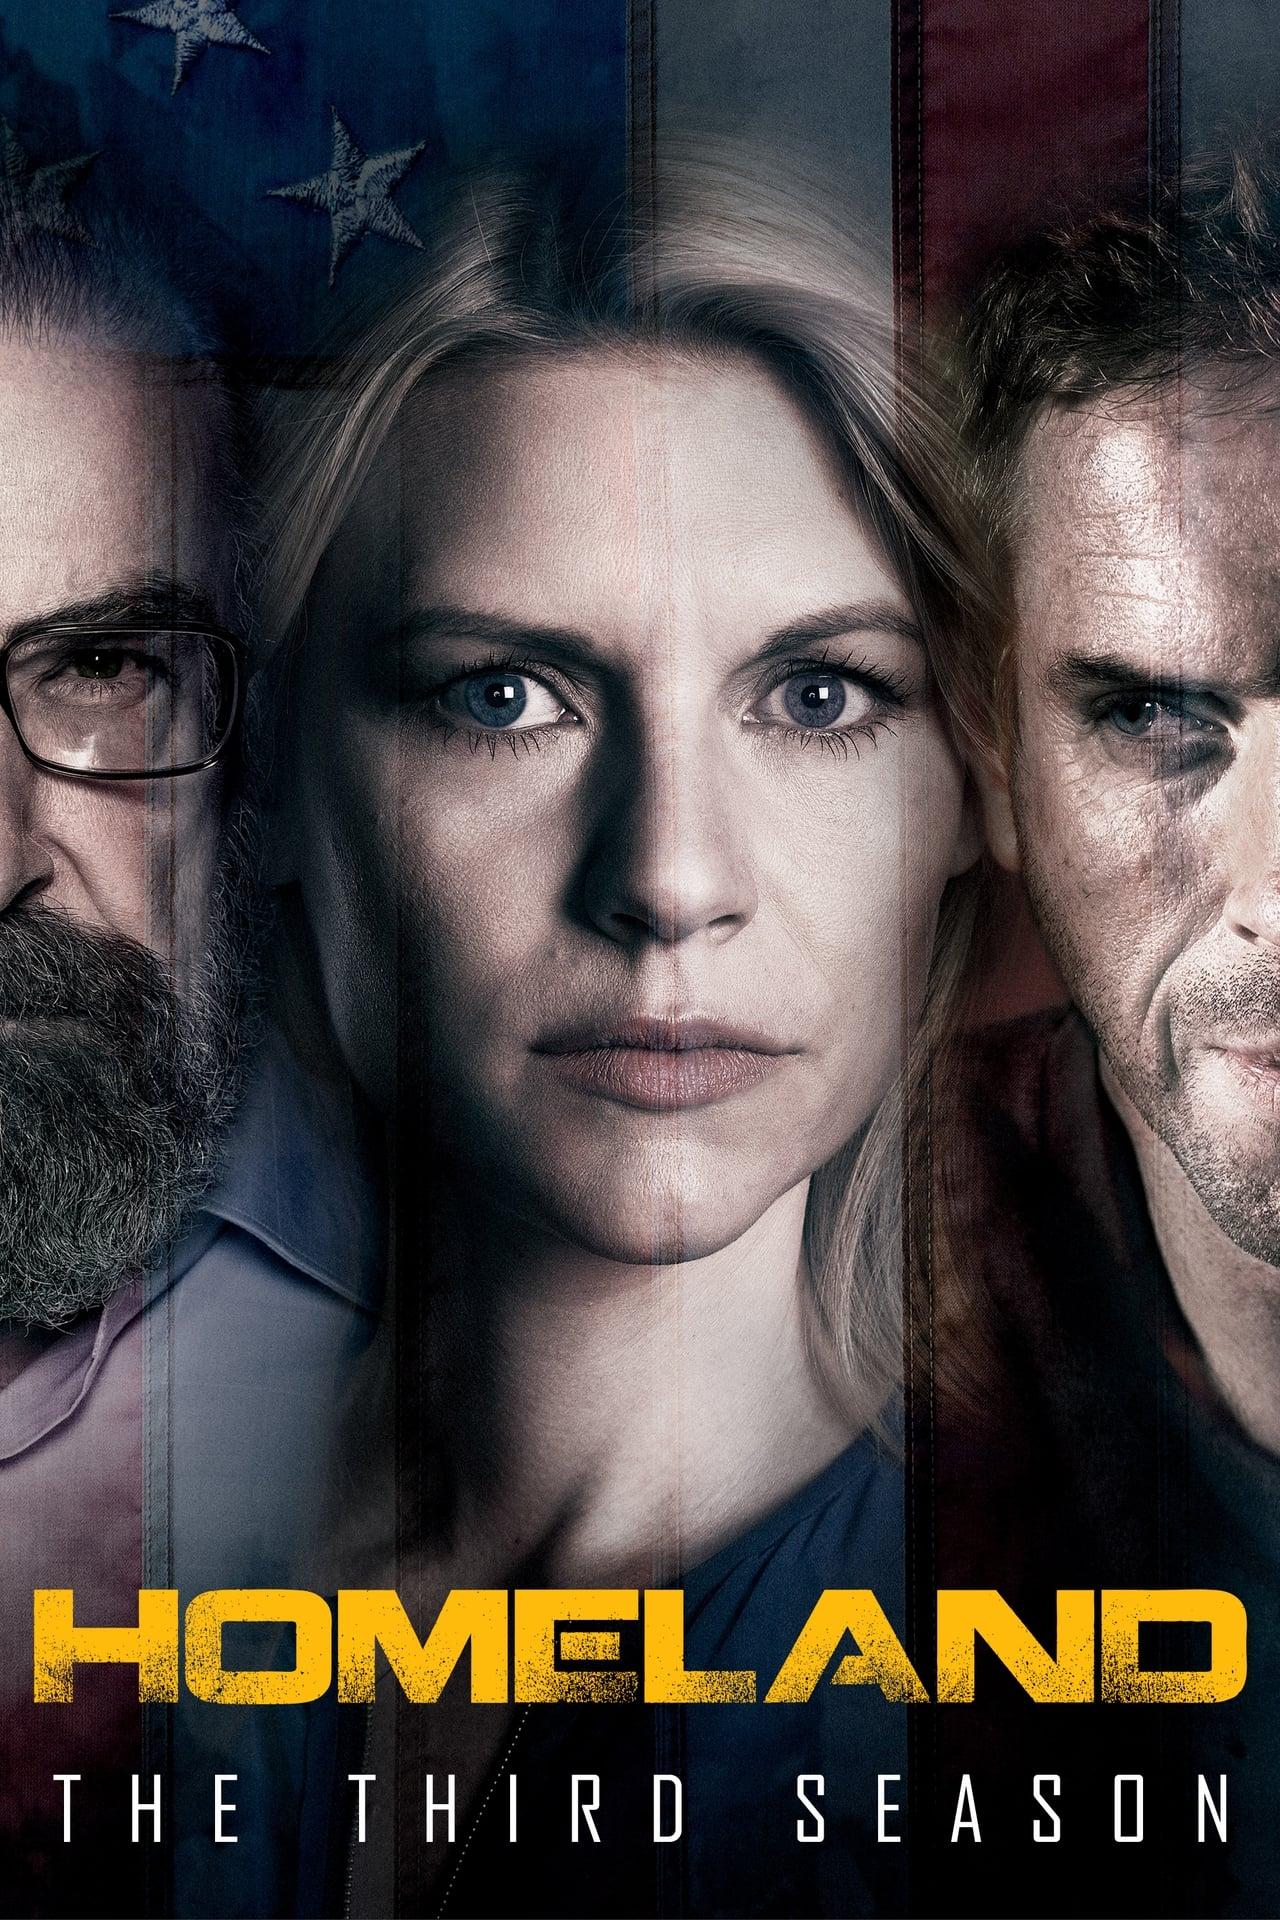 Homeland (2013)